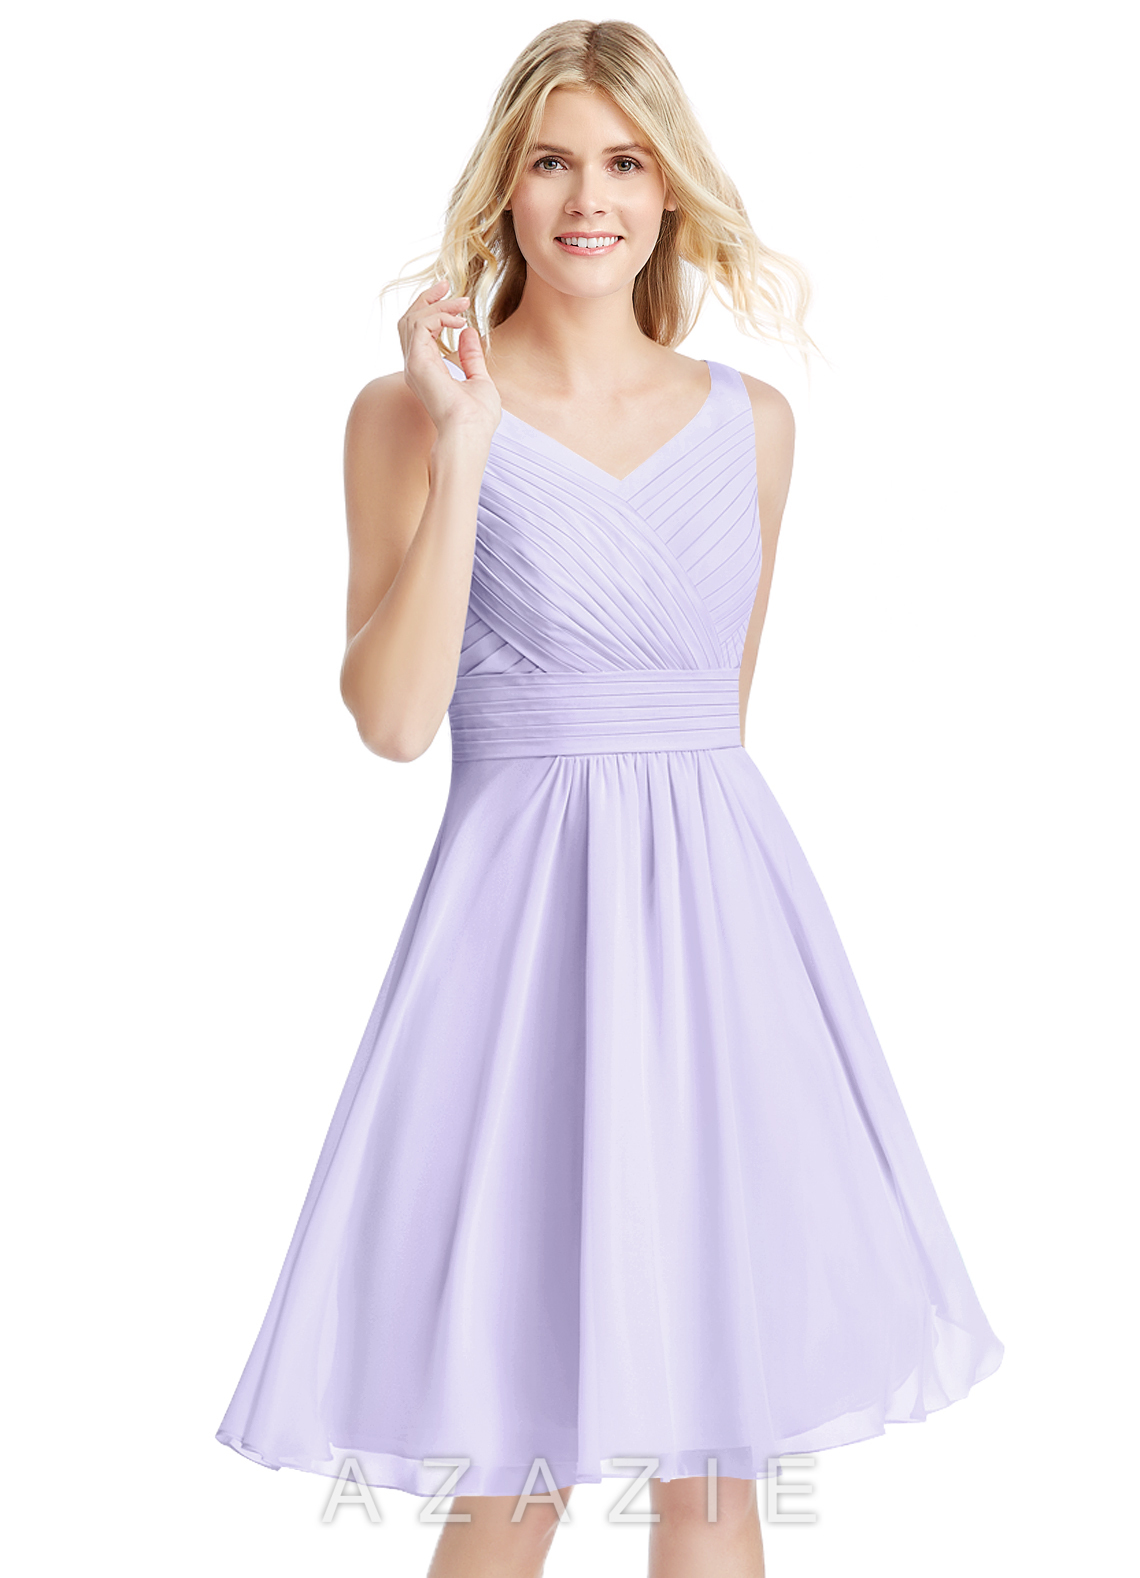 51915264c6a Azazie Grace Bridesmaid Dress - Lilac